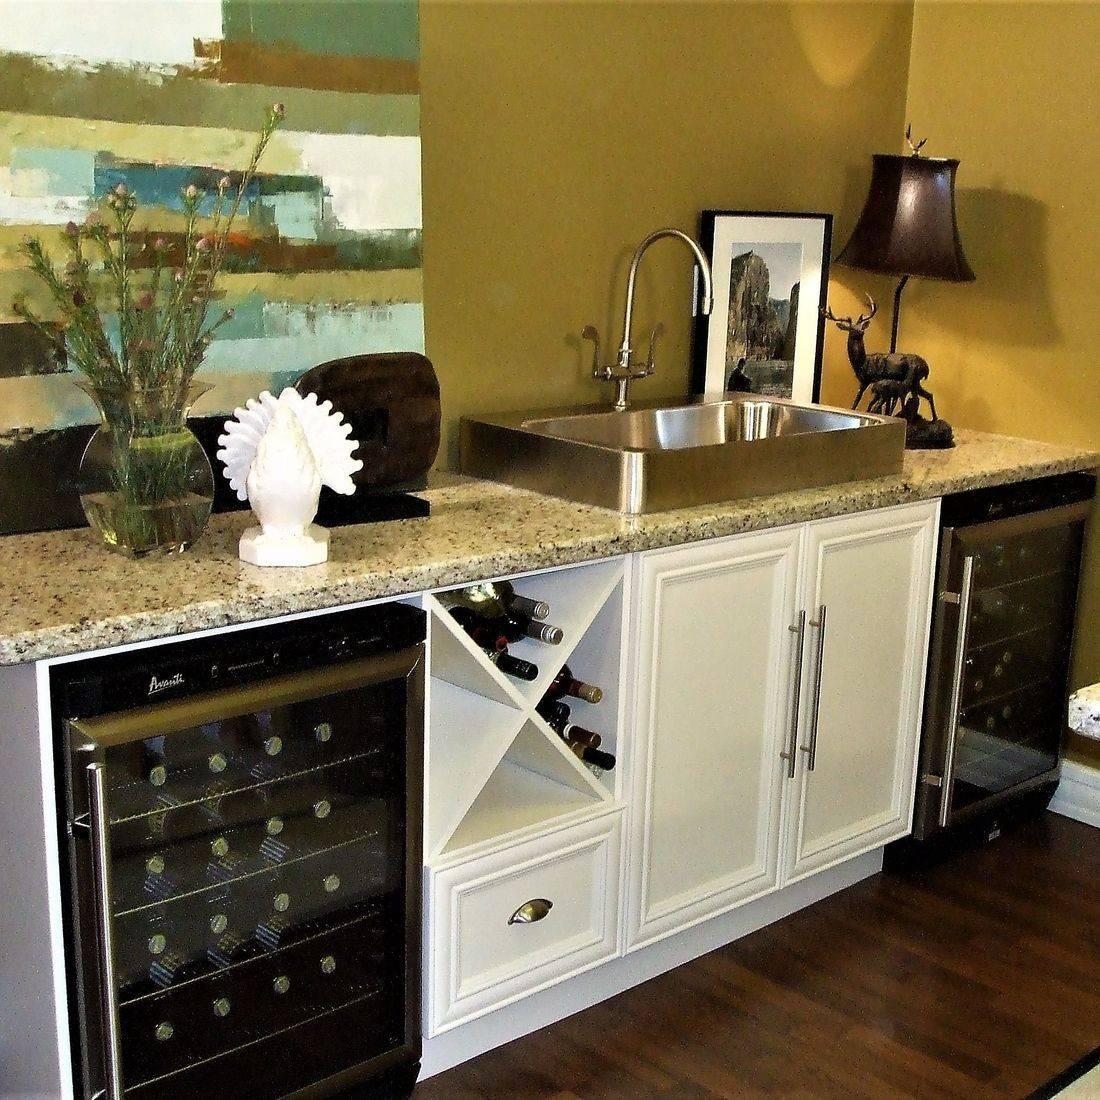 Sibra Kitchens Markham Toronto cabinets basement bar HGTV